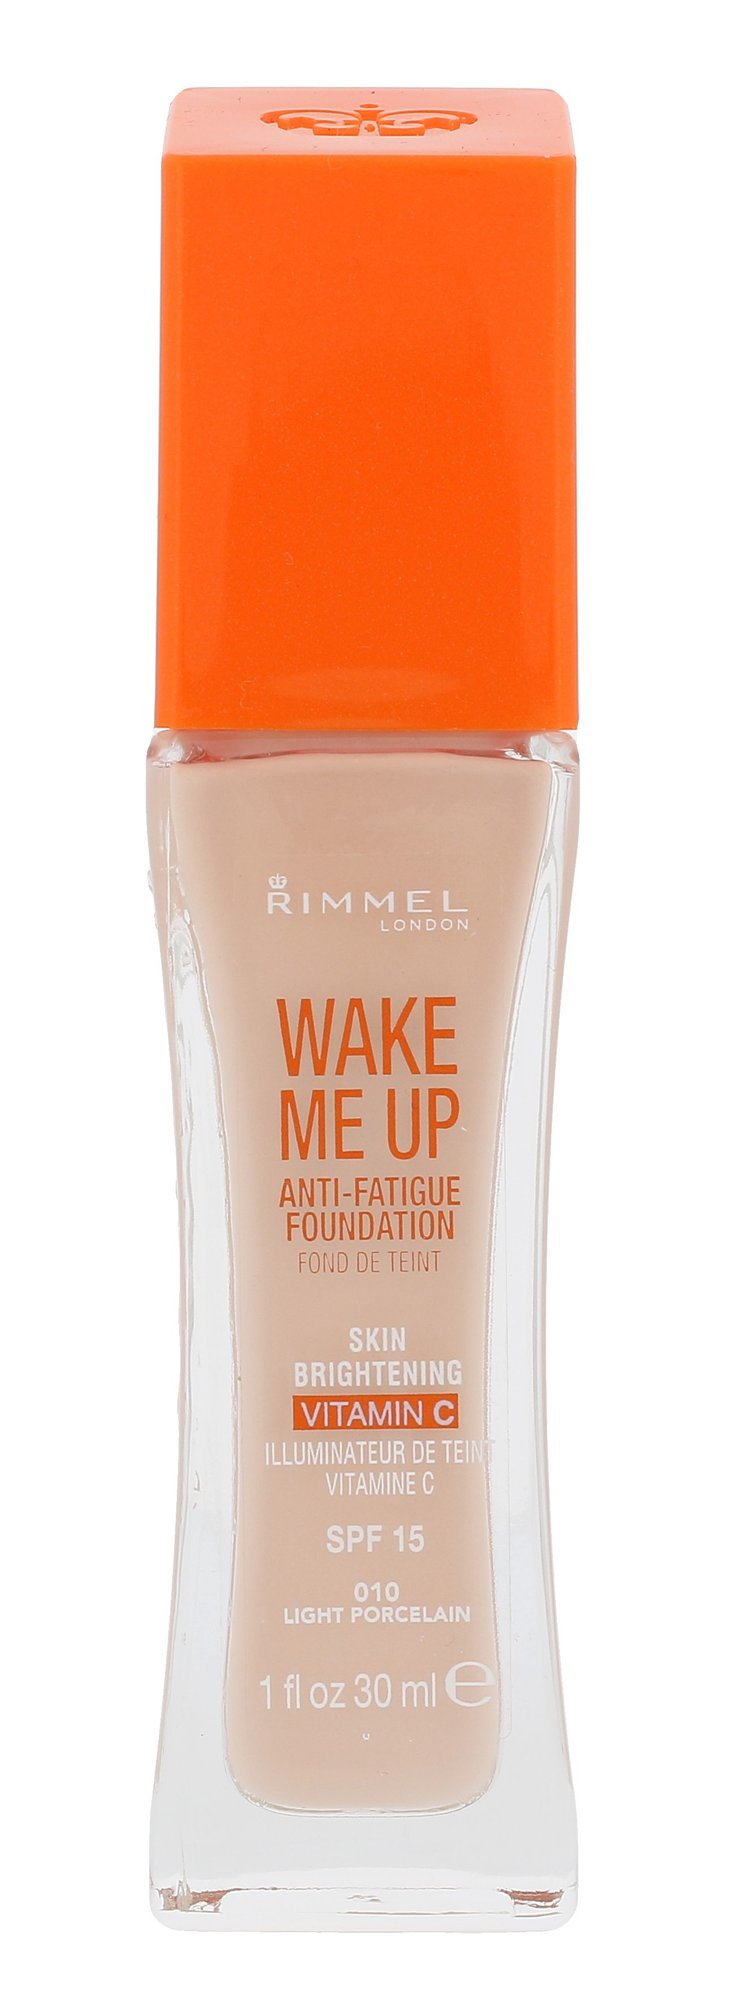 Rimmel London Wake Me Up Cosmetic 30ml 010 Light Porcelain